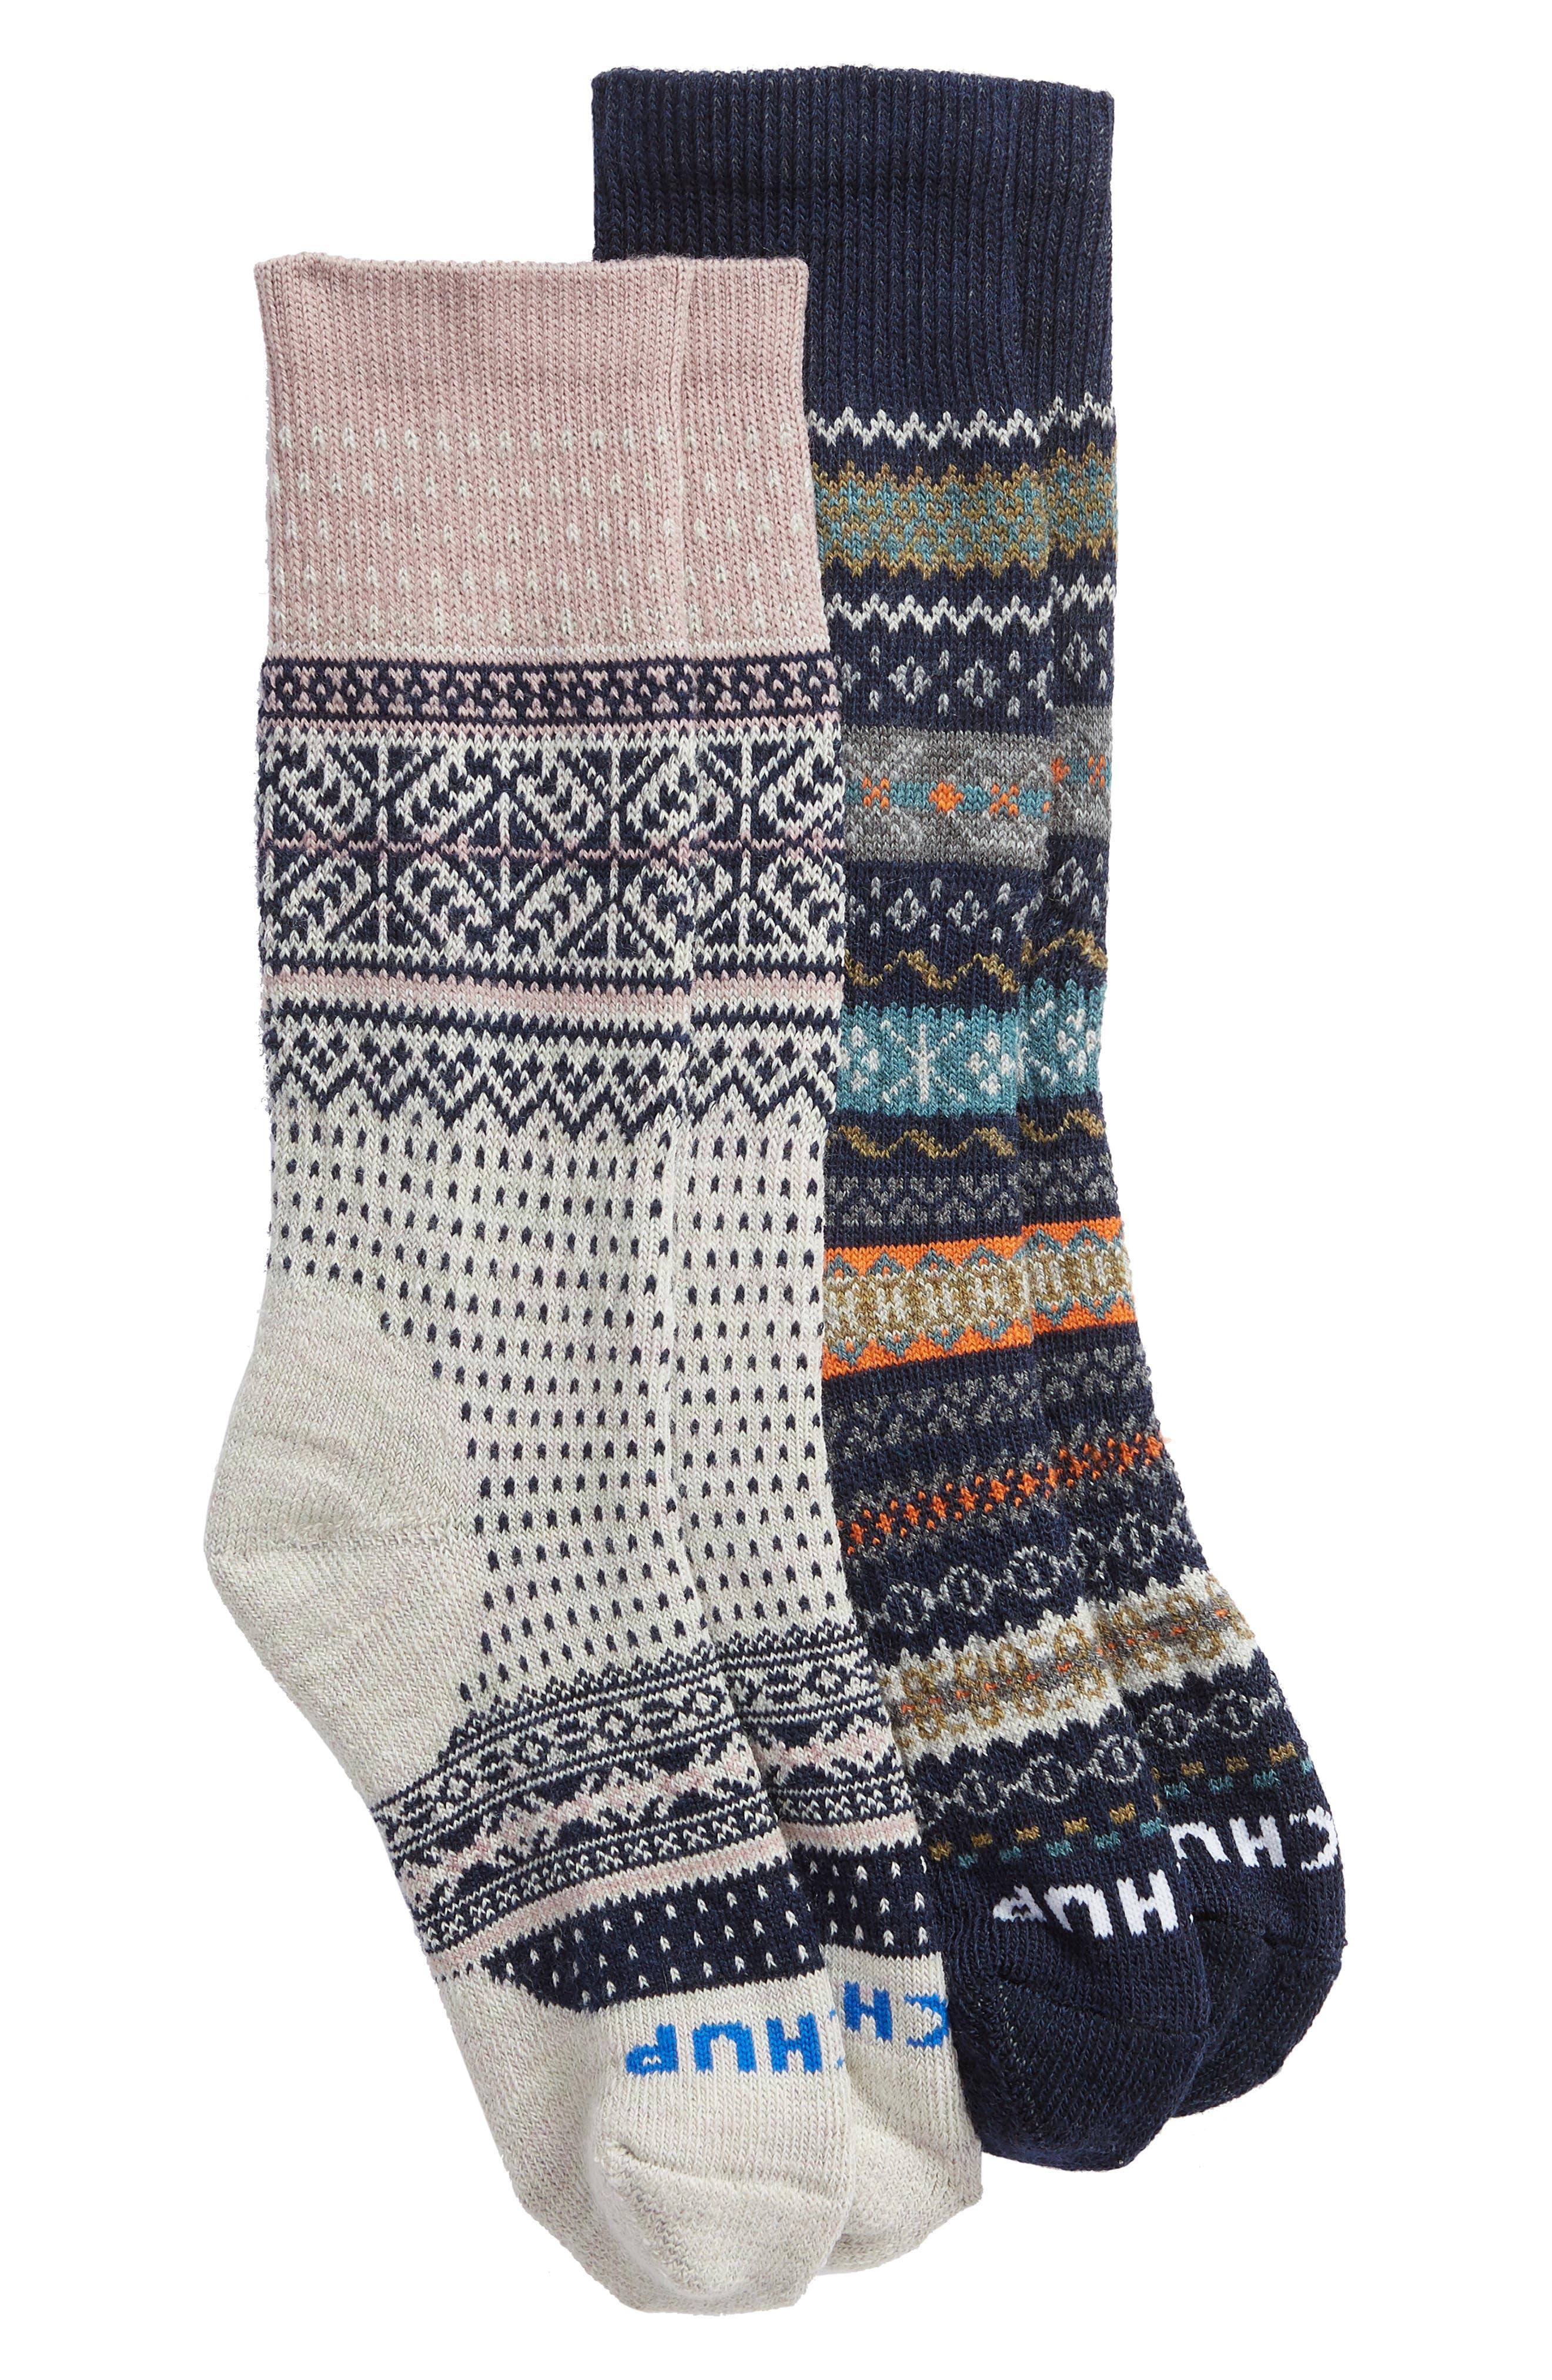 SMARTWOOL x CHUP 2-Pack Merino Wool Socks, Main, color, 410